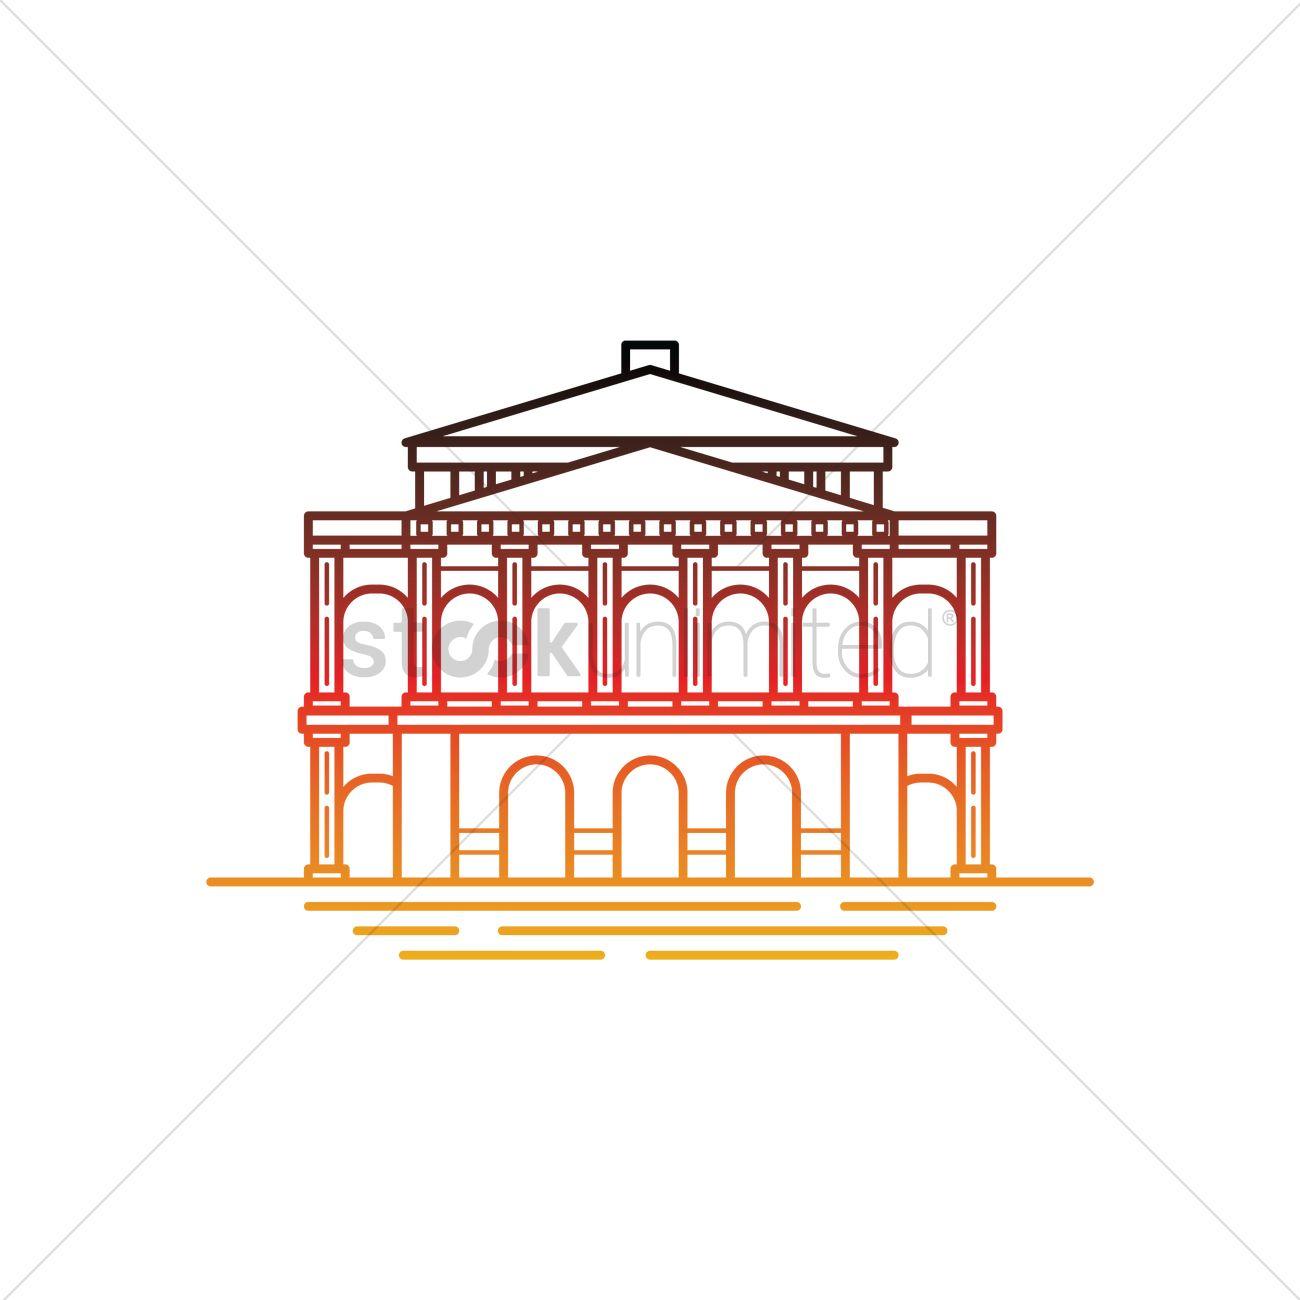 Frankfurt old opera house Vector Image.